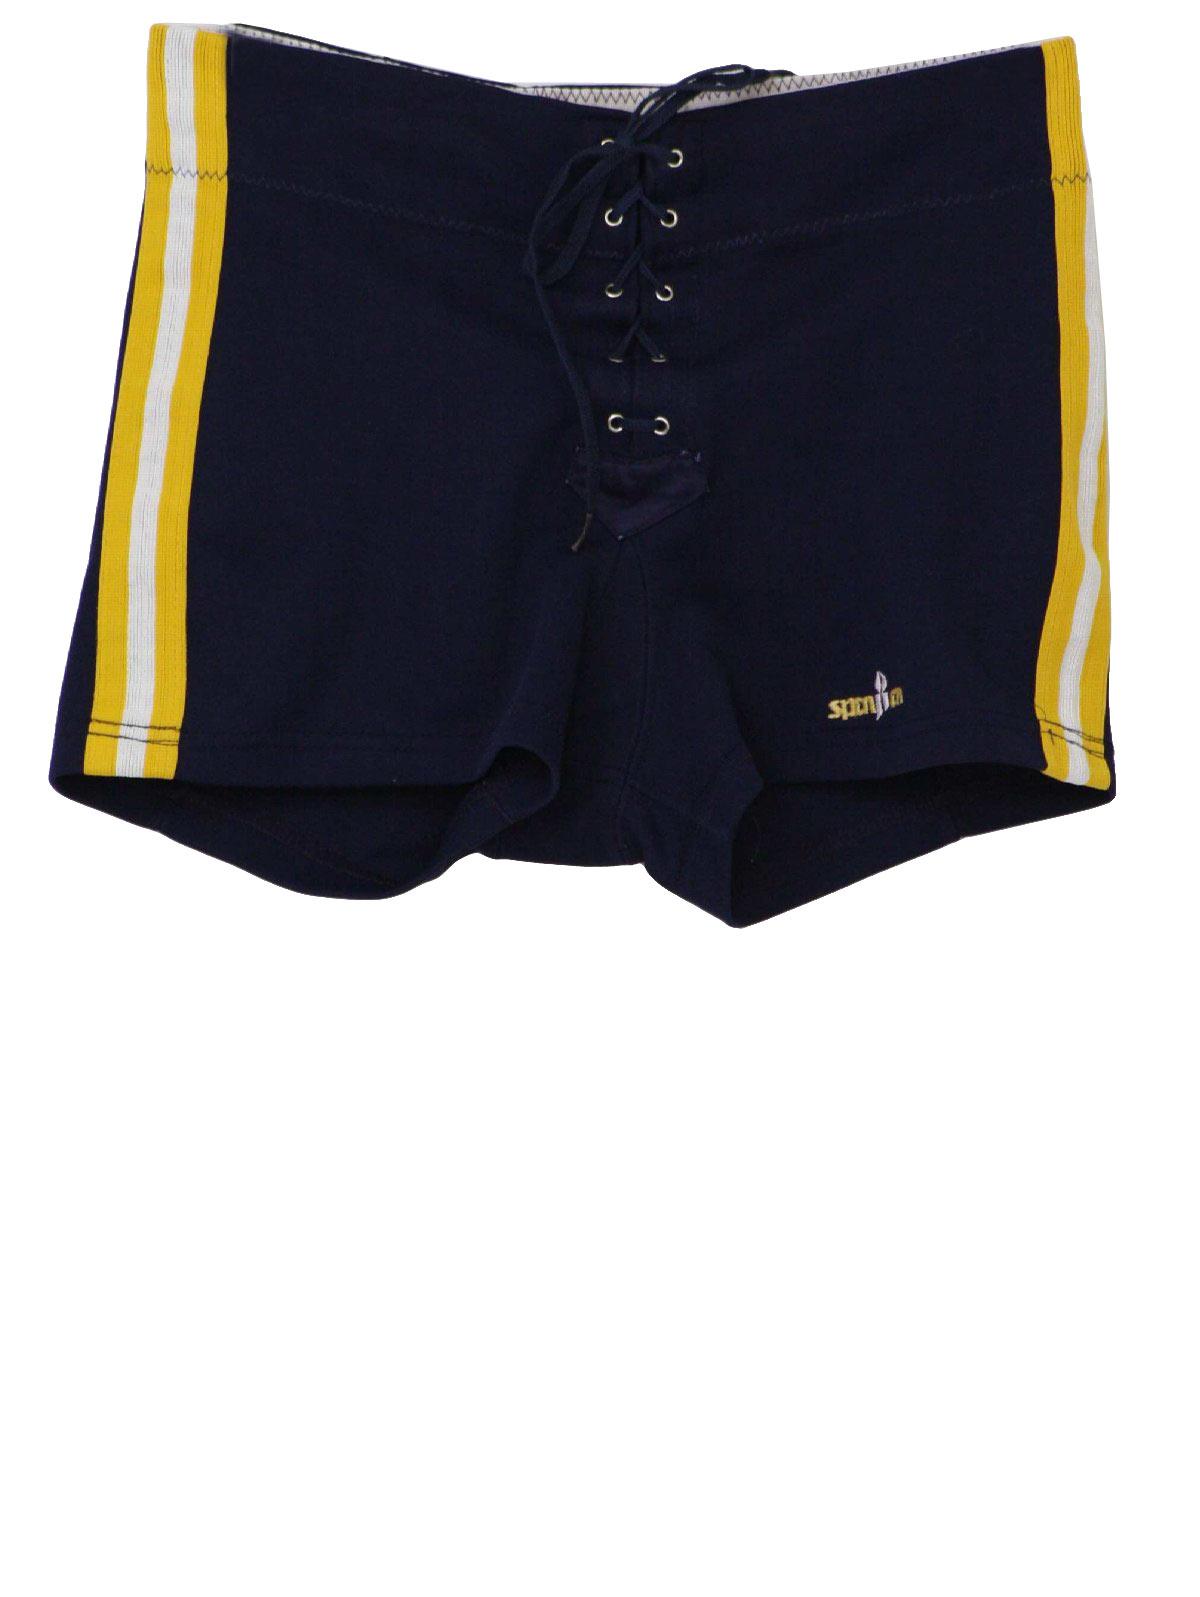 1980 S Vintage Spanjan Shorts 80s Spanjan Mens Blue